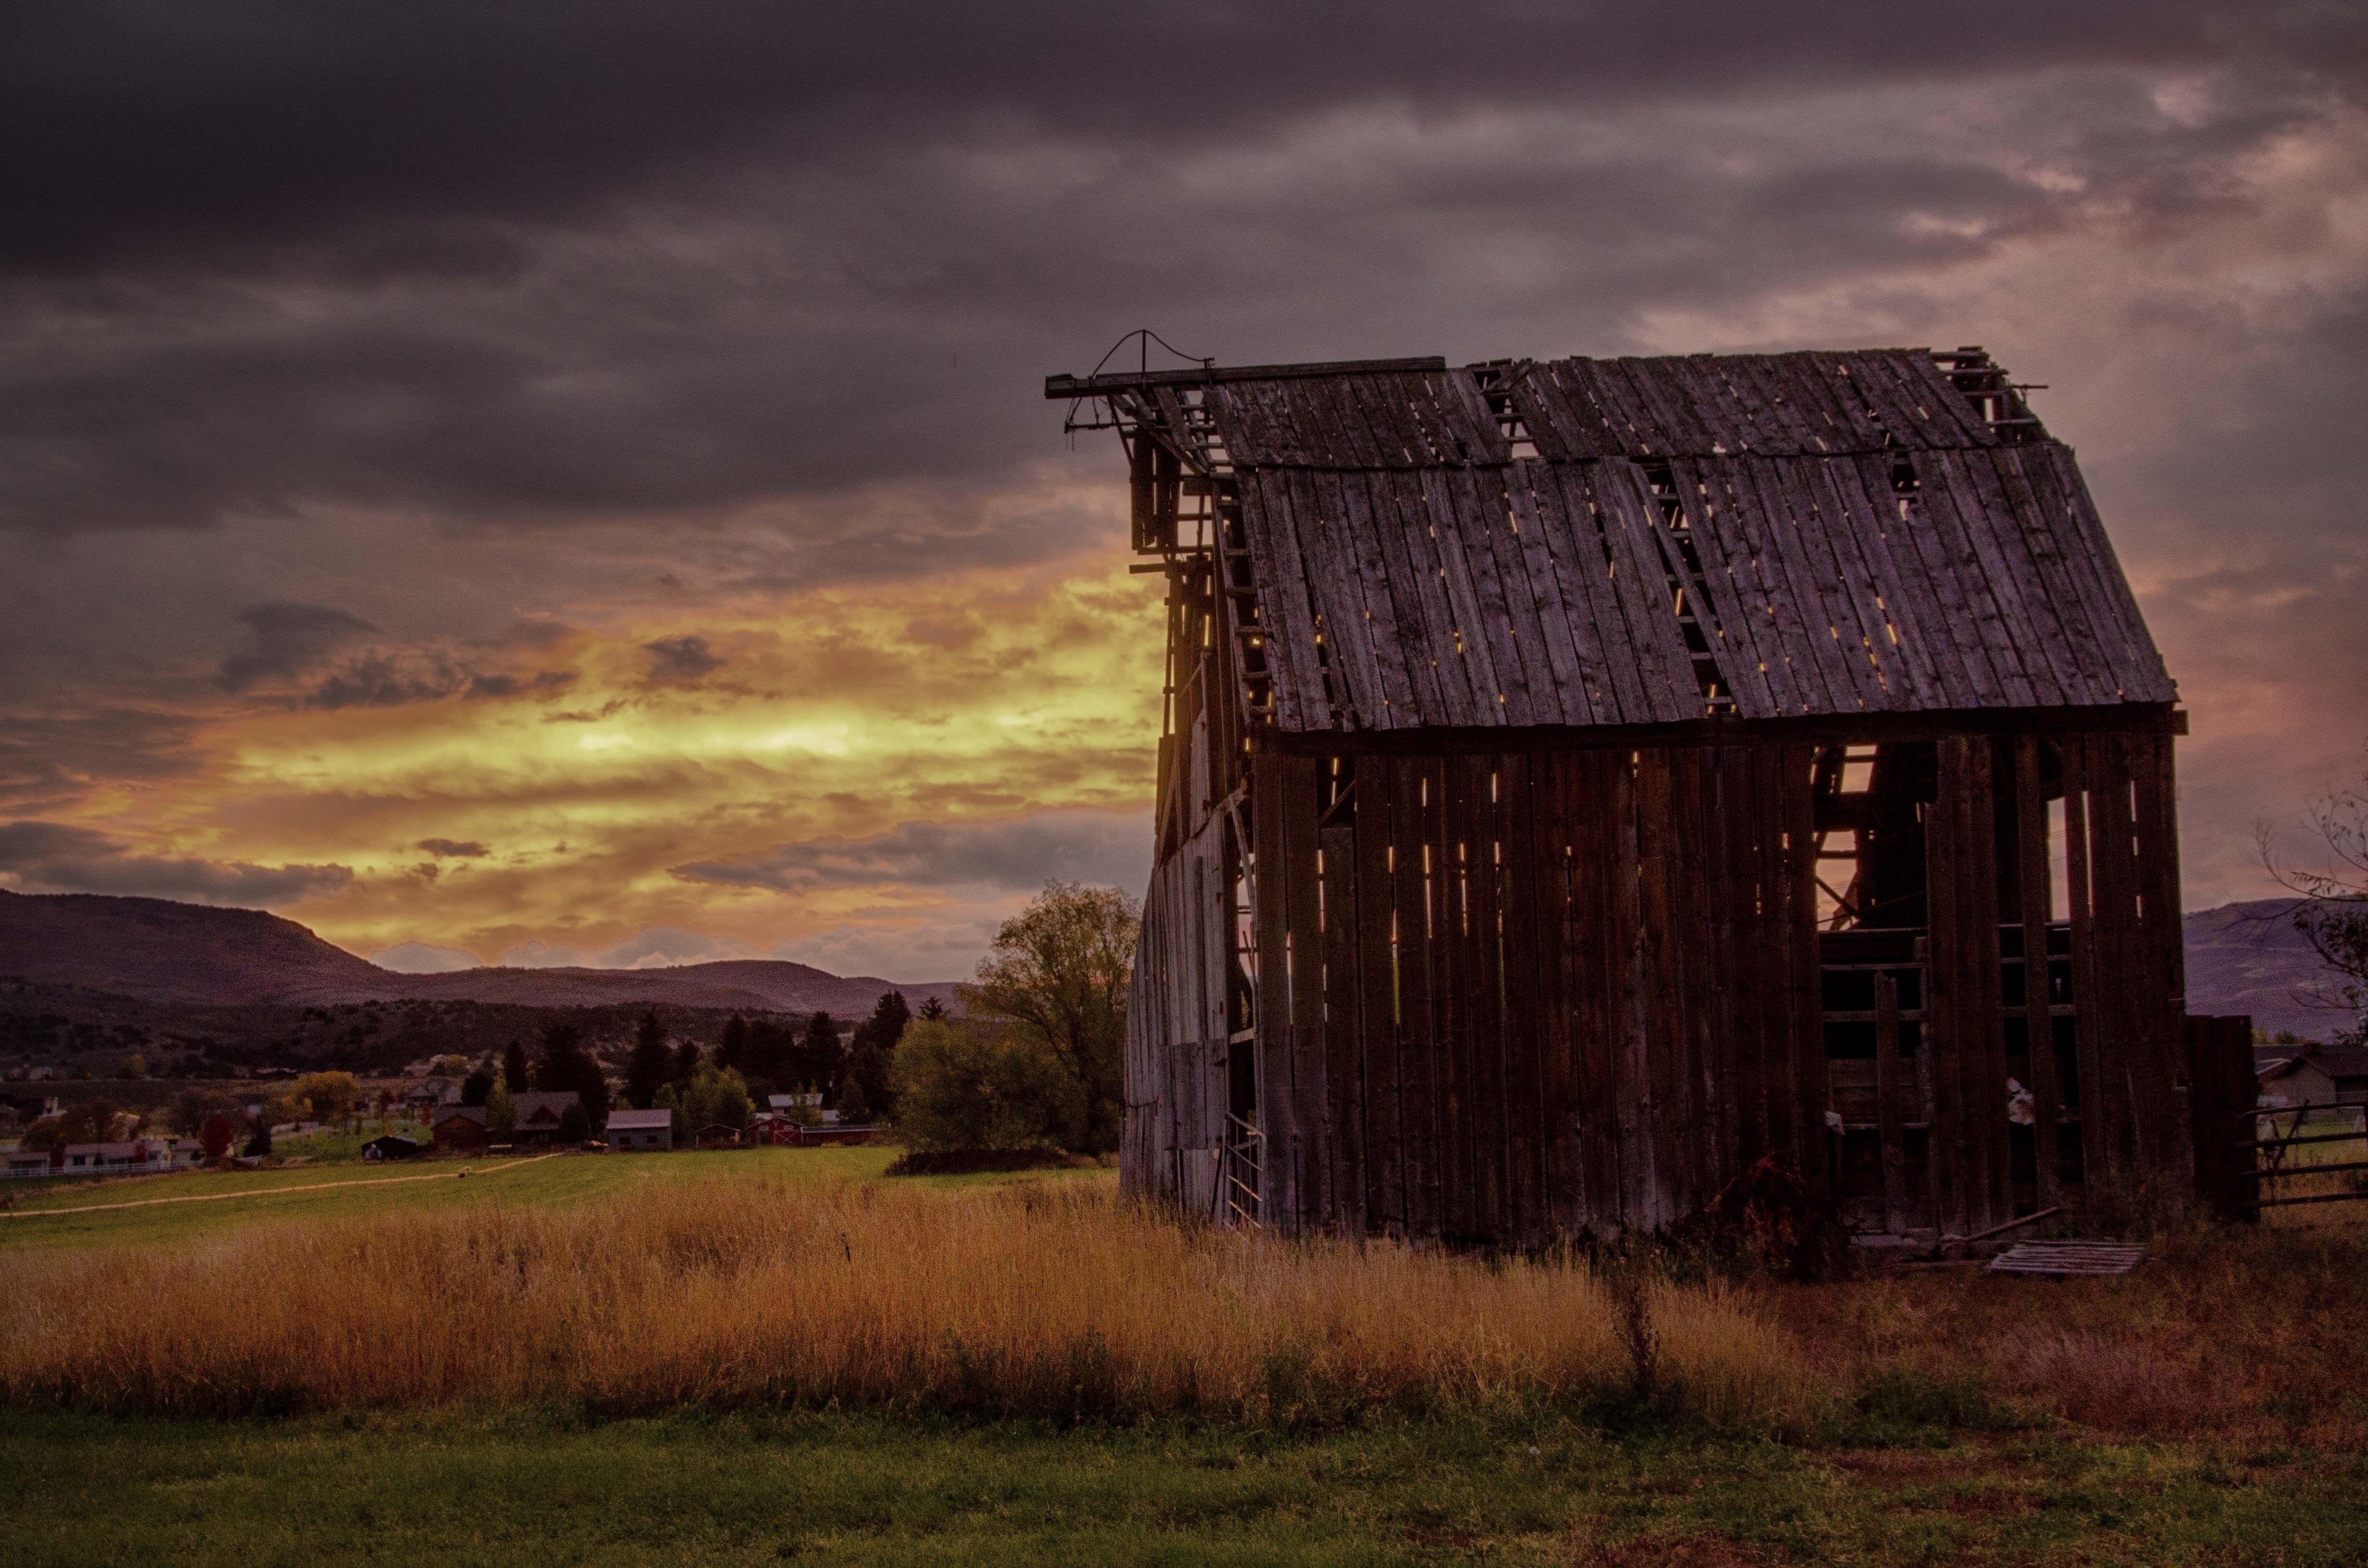 Sunrise over a run-down barn in Utah.